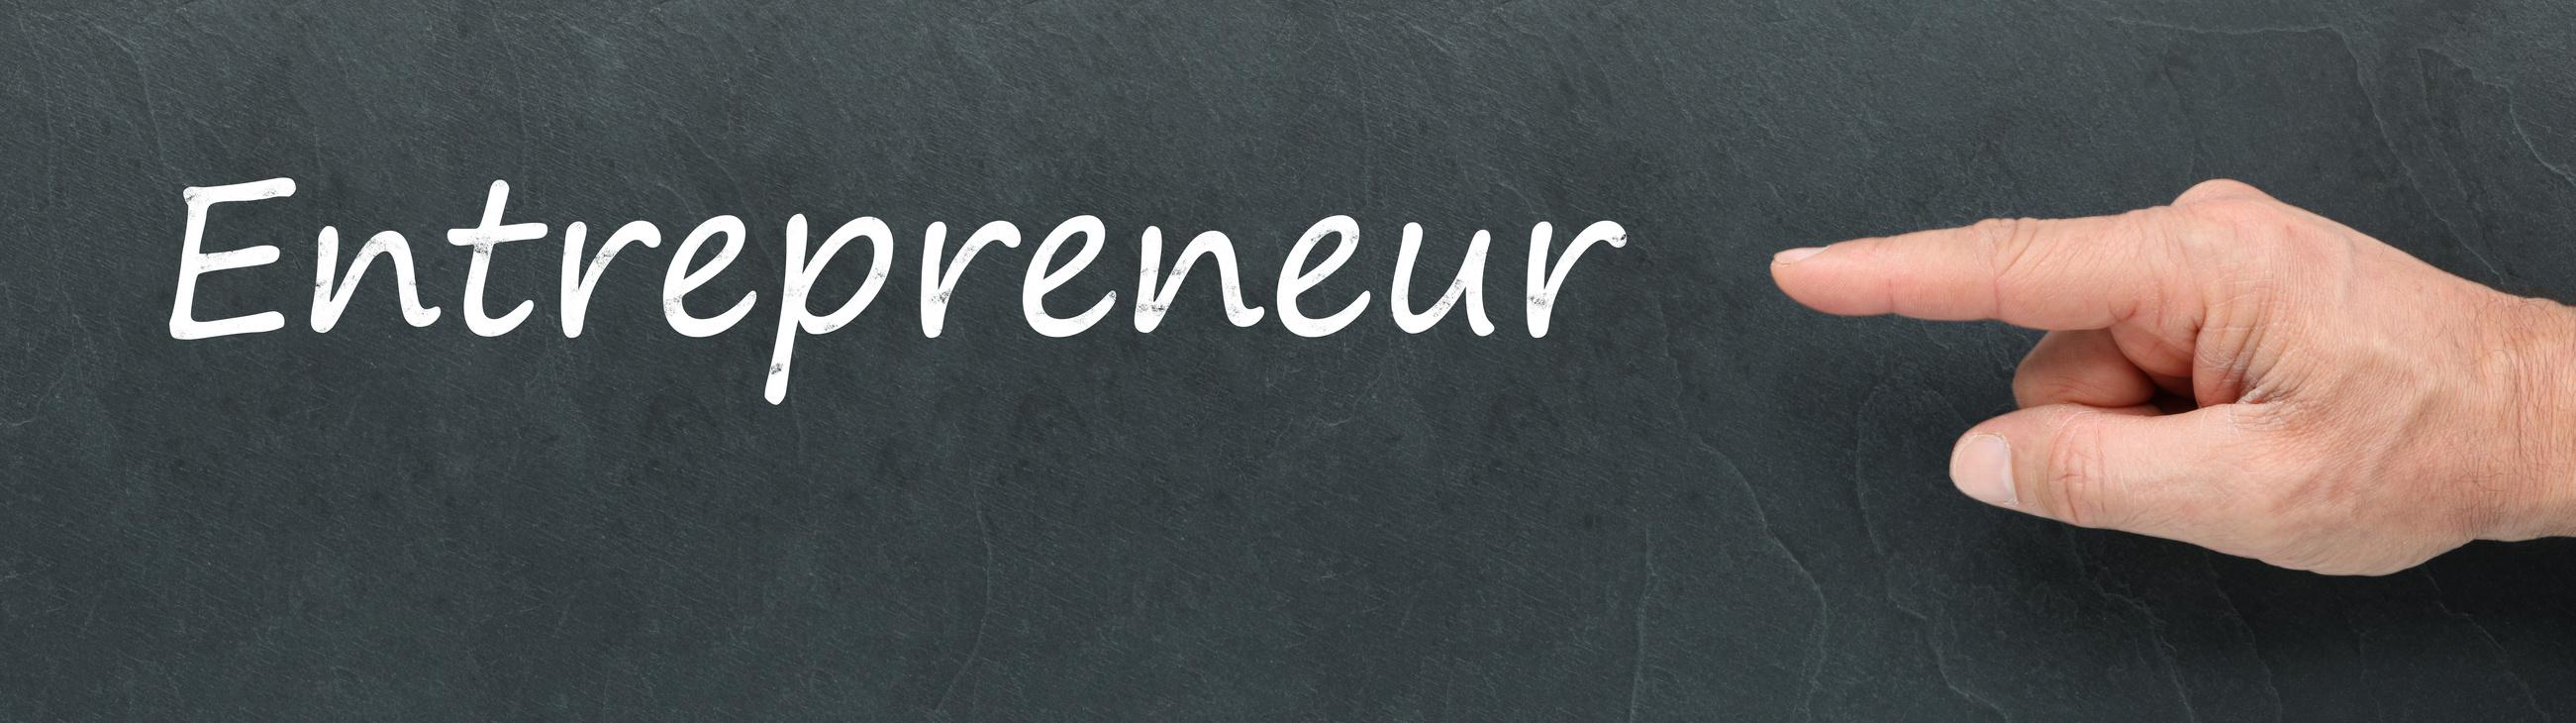 entrepreneur agile